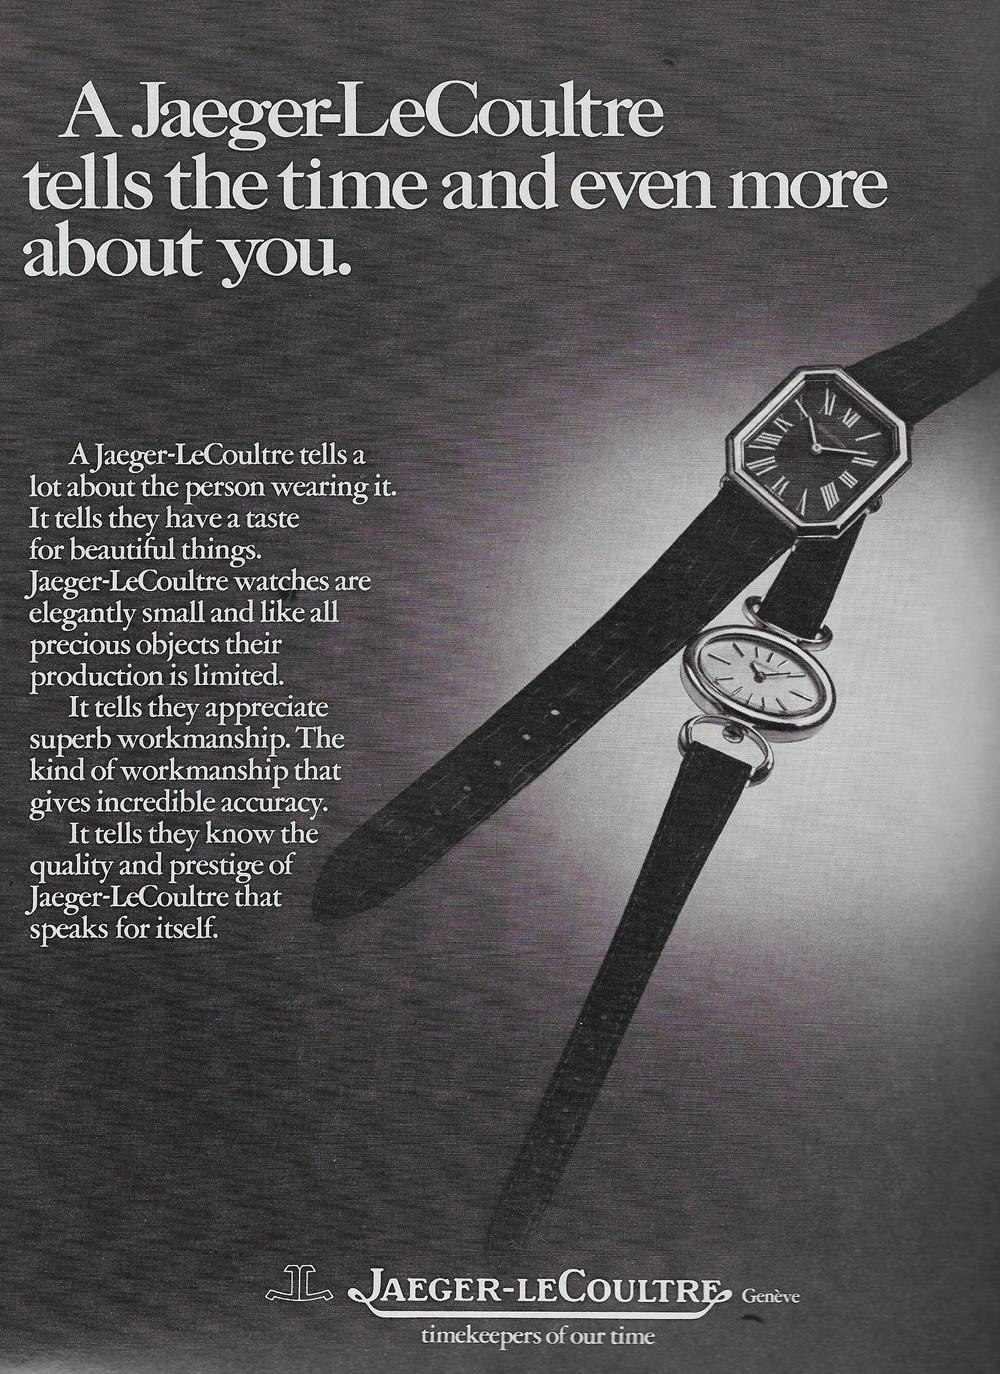 Vintage Jaeger-LeCoultre Advert 1973 .JPG